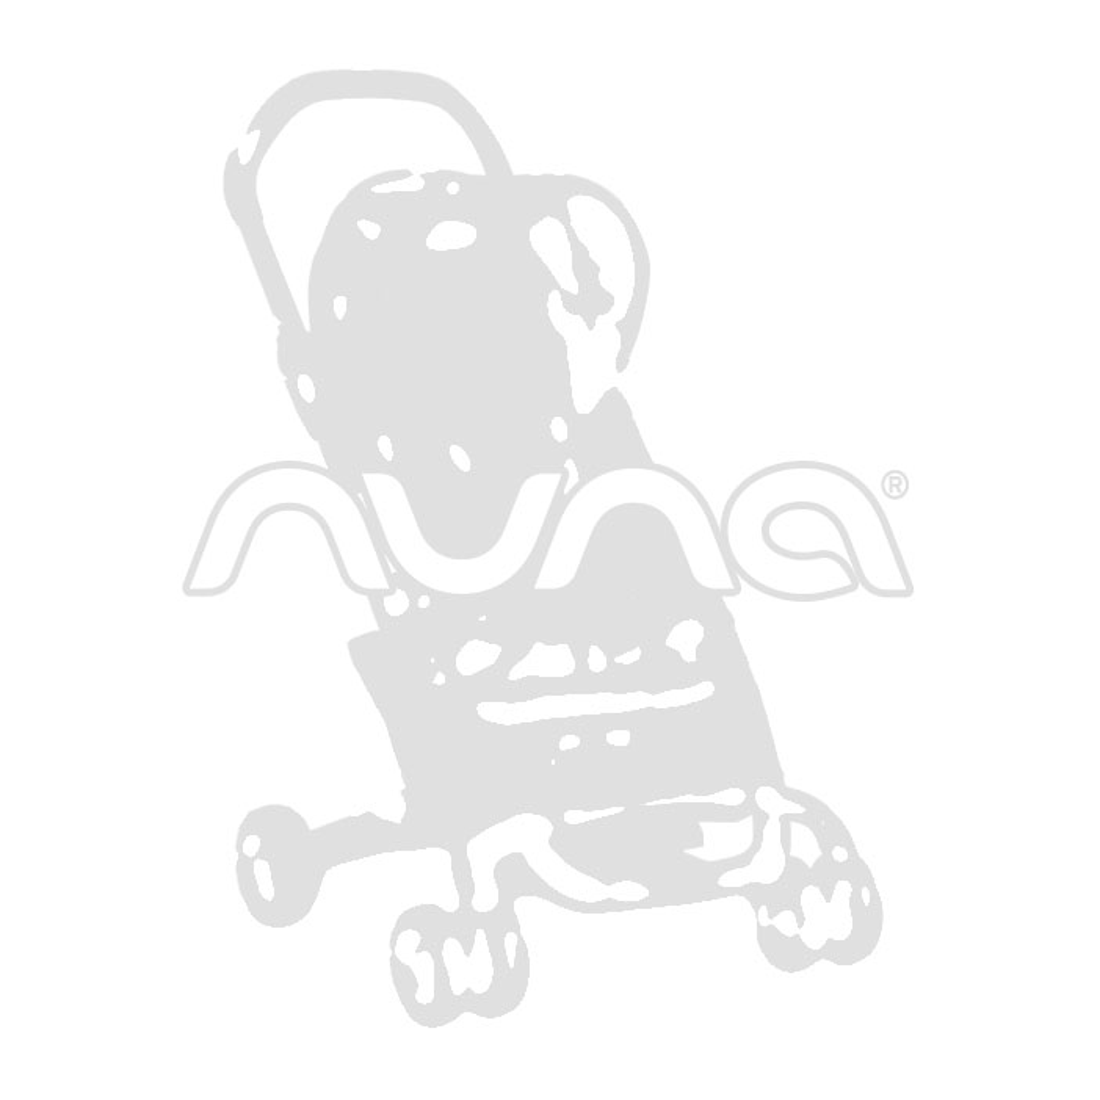 MIXX carry cot